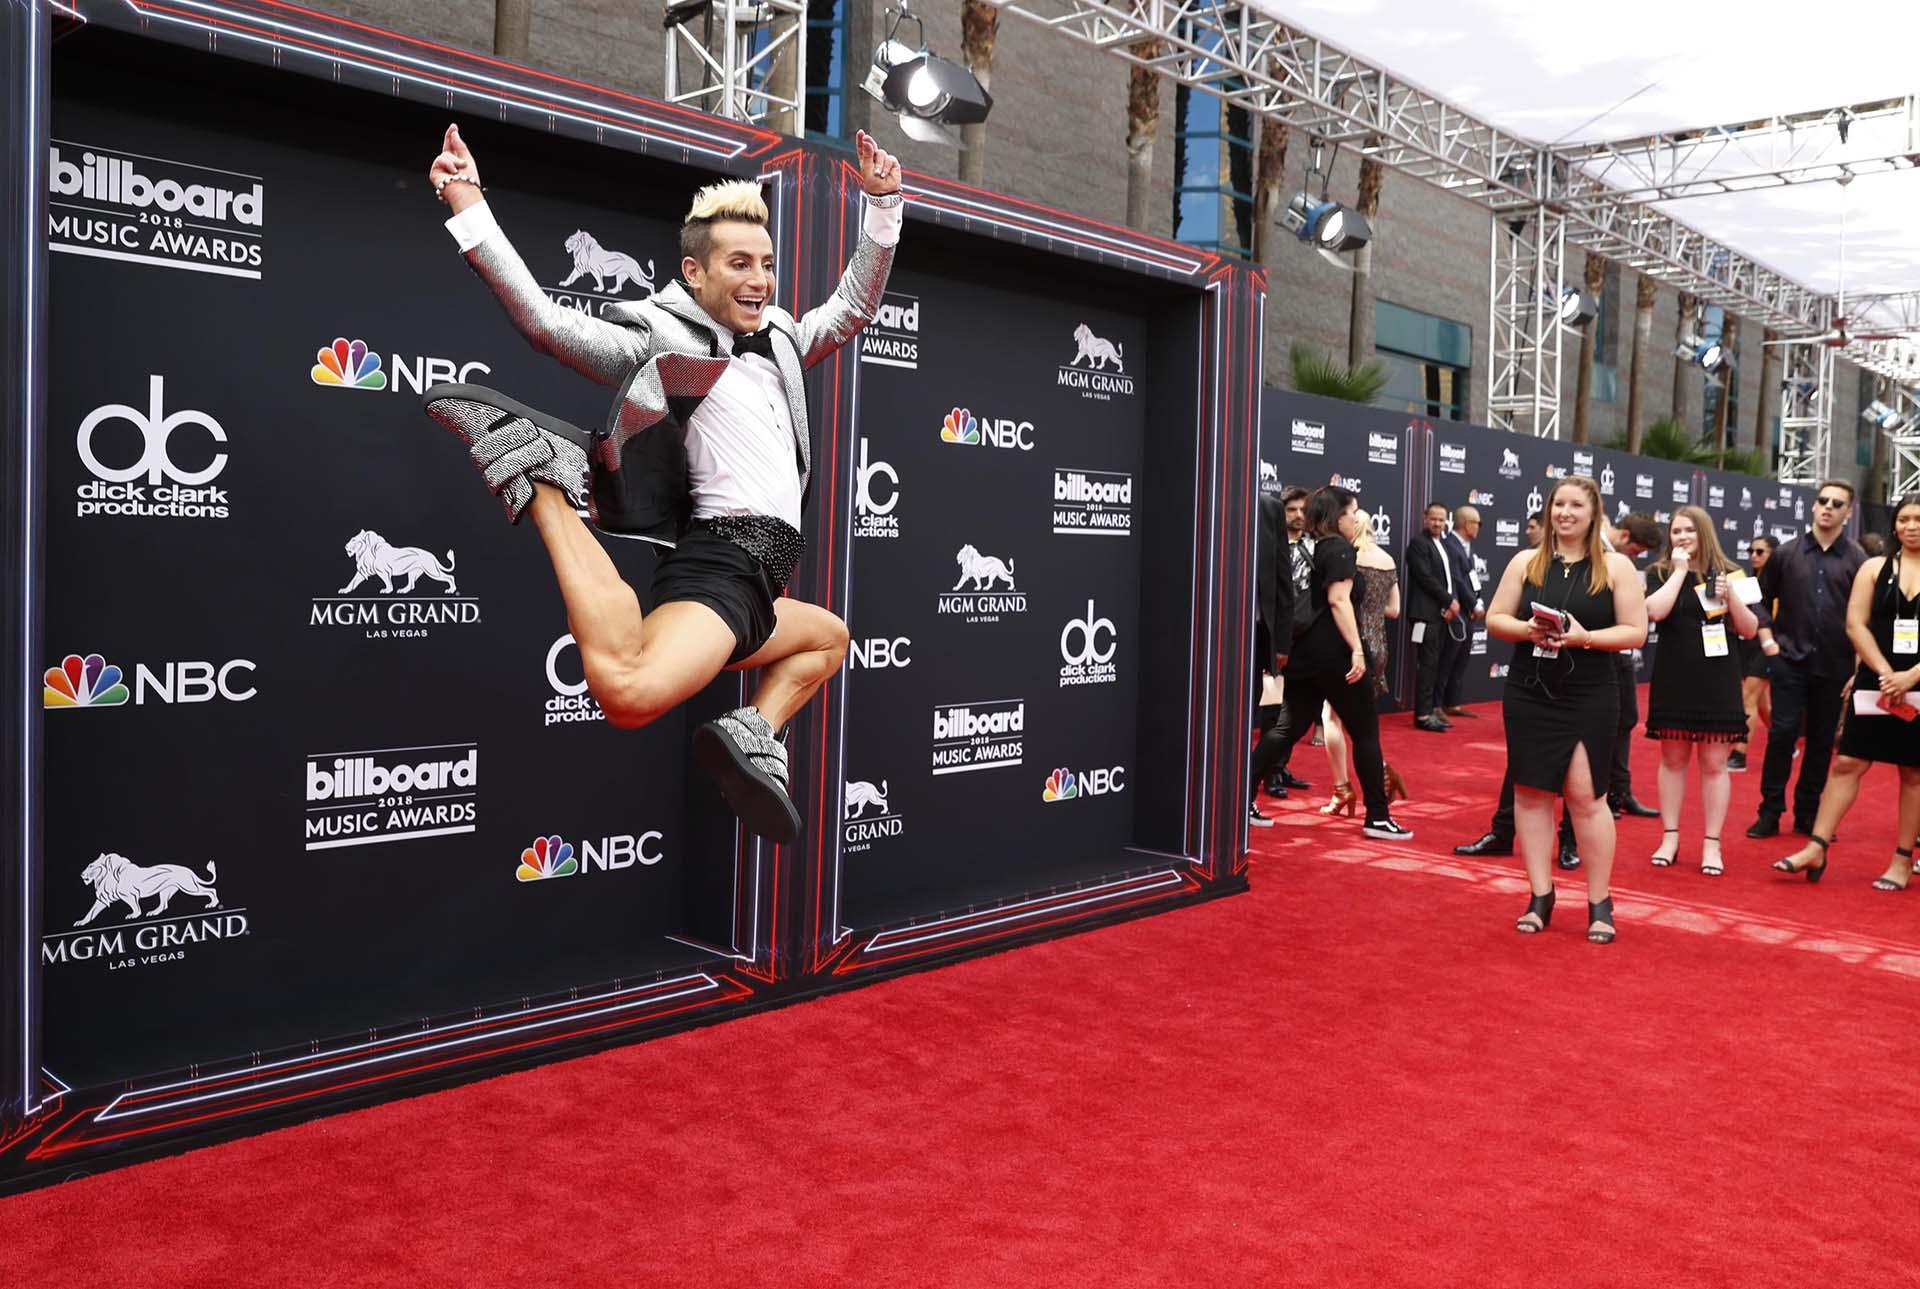 2018 Billboard Music Awards – Arrivals – Las Vegas, Nevada, U.S., 20/05/2018 – Frankie J. Grande. REUTERS/Steve Marcus